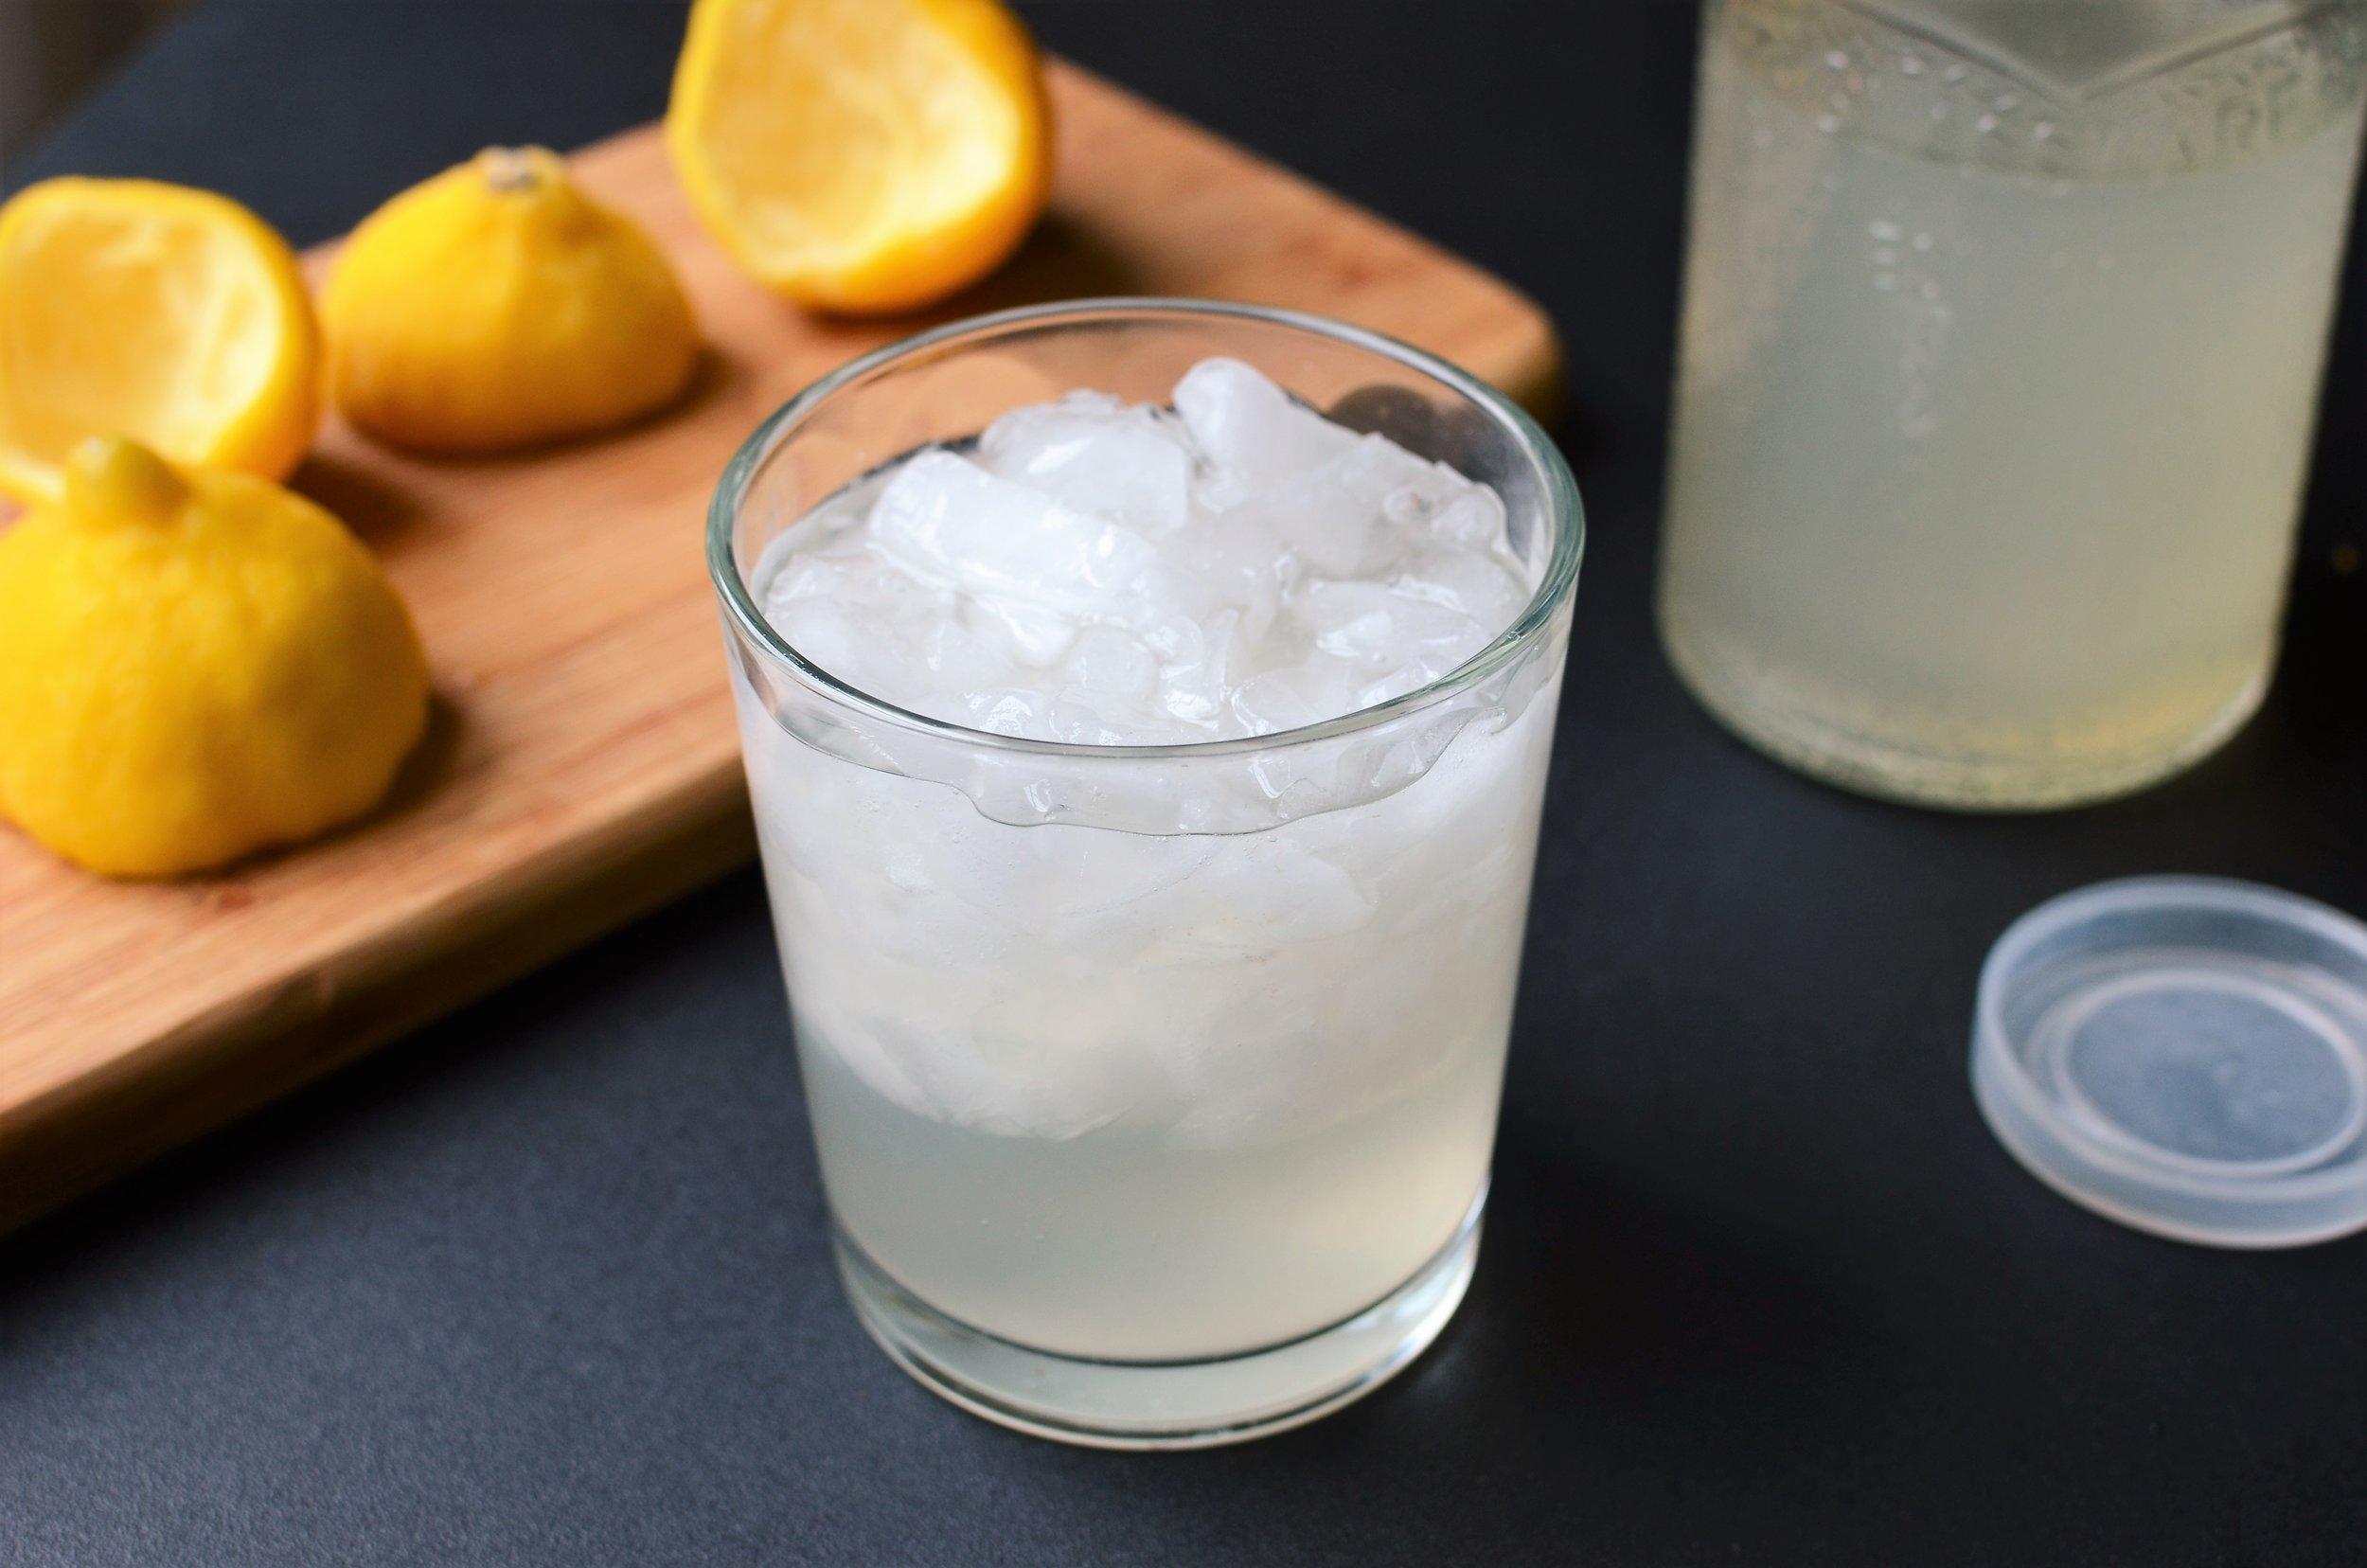 Freshly Squeezed Lemonade - ButterYum. how to make lemonade. lemonade from scratch recipe. how to make lemonaid.